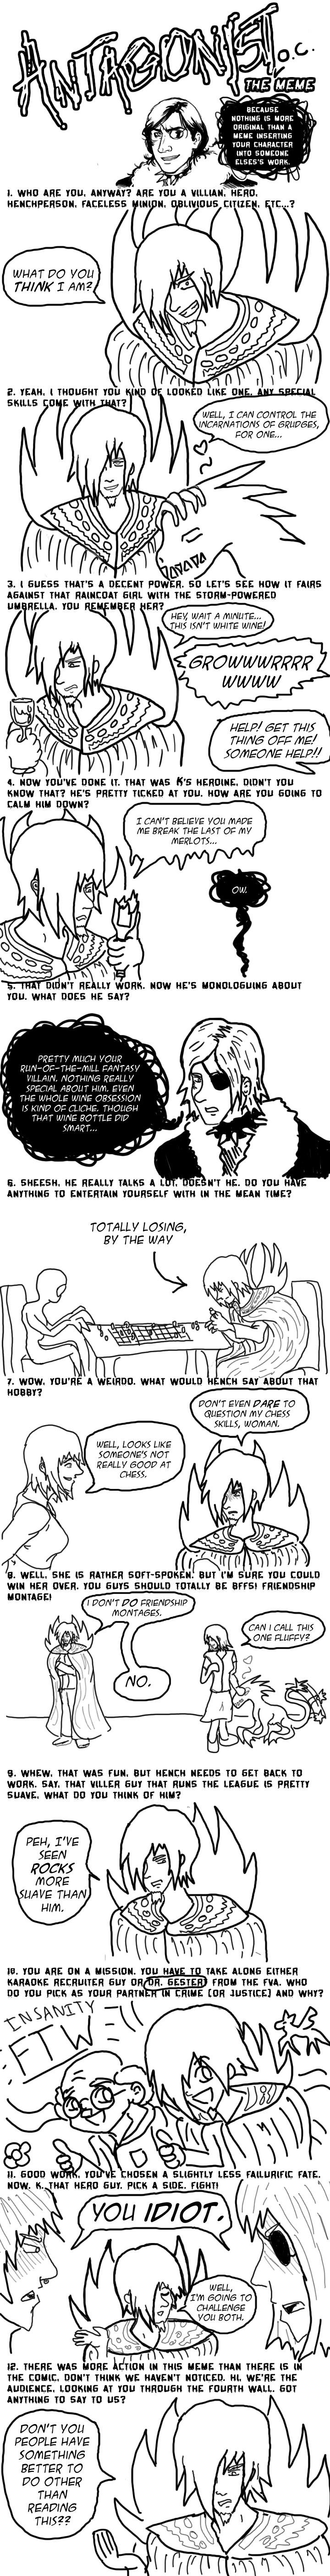 Antagonist Original Character Meme Entry #2